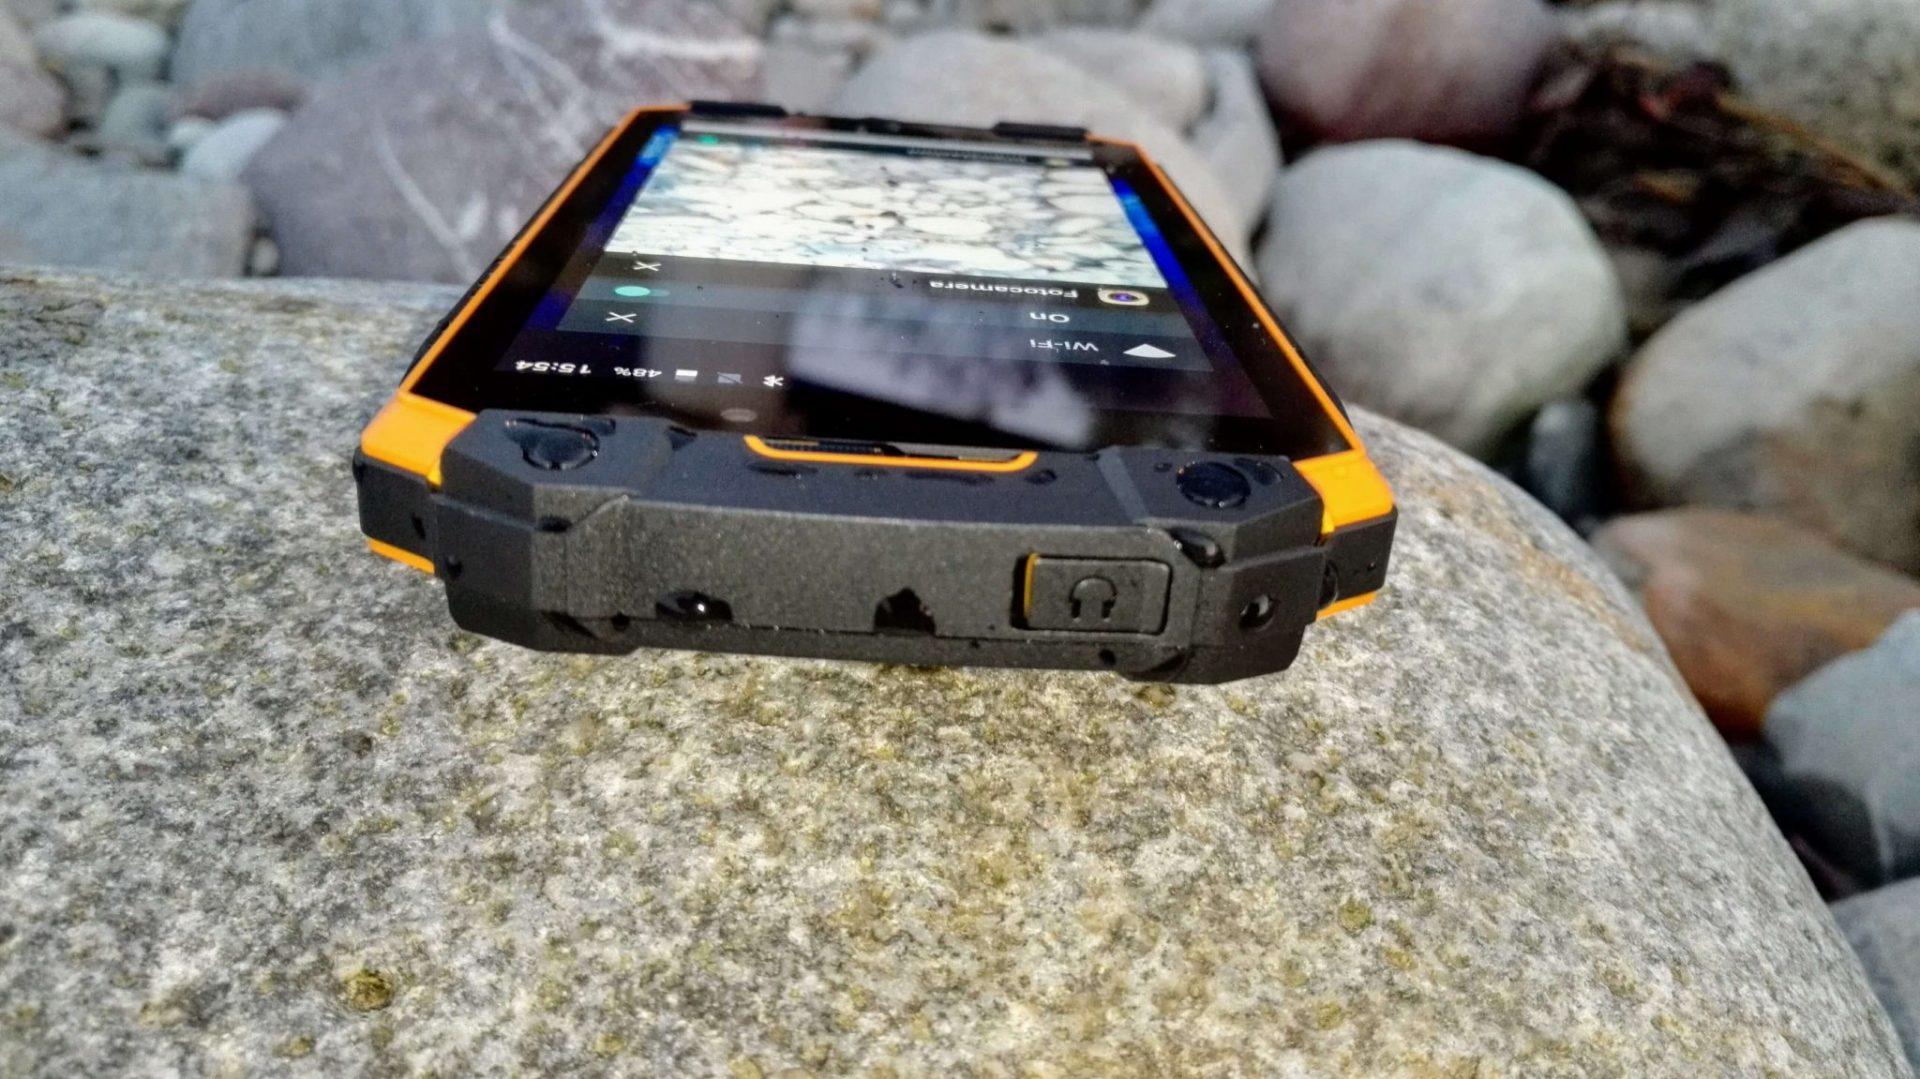 Poptel P9000 Max 22